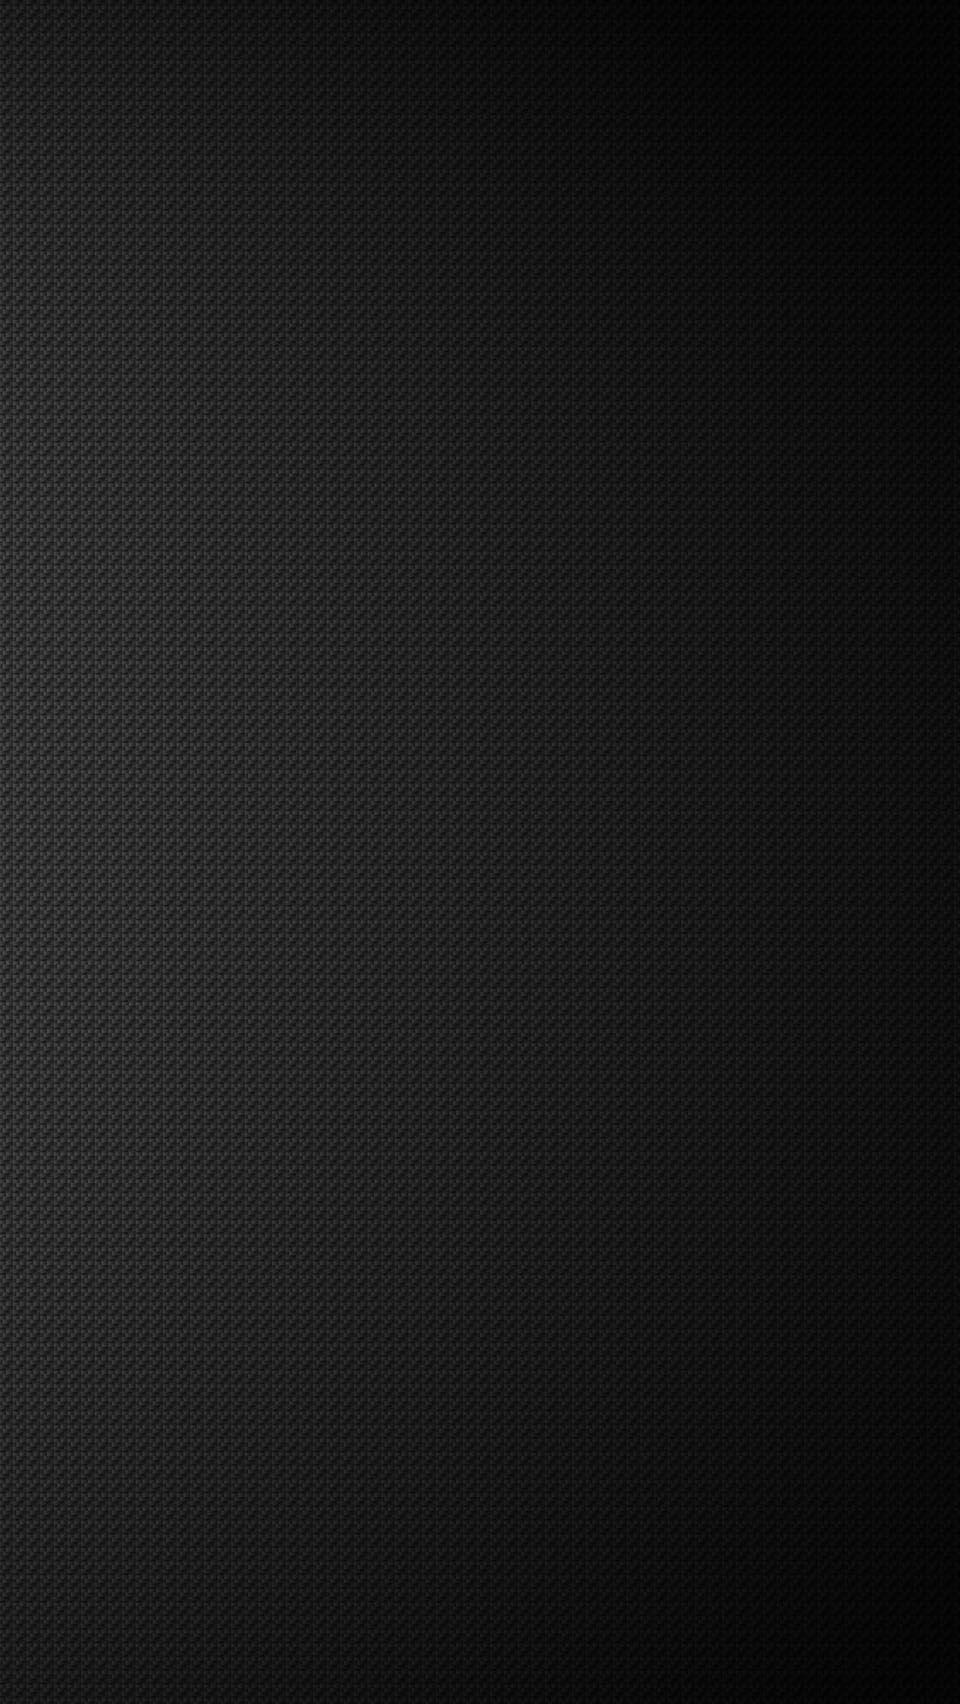 Best Iphone Wallpapers Hd Photo Plain Black Wallpaper Pure Black Wallpaper Android Wallpaper Black